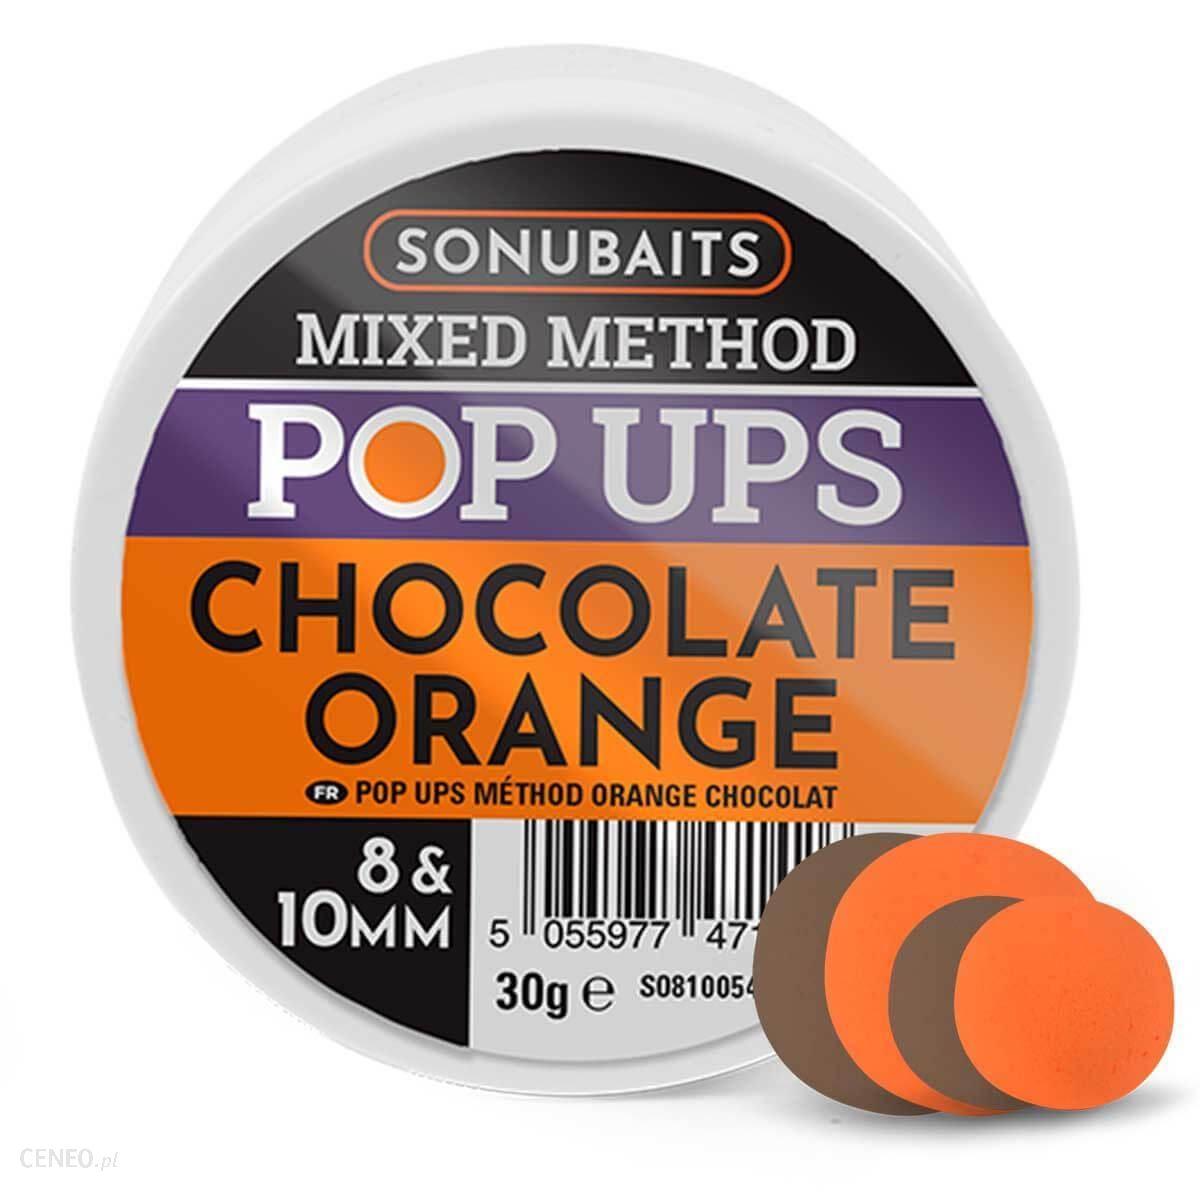 Sonubaits Mixed Method Pop Ups Chocolate Orange 8/10Mm